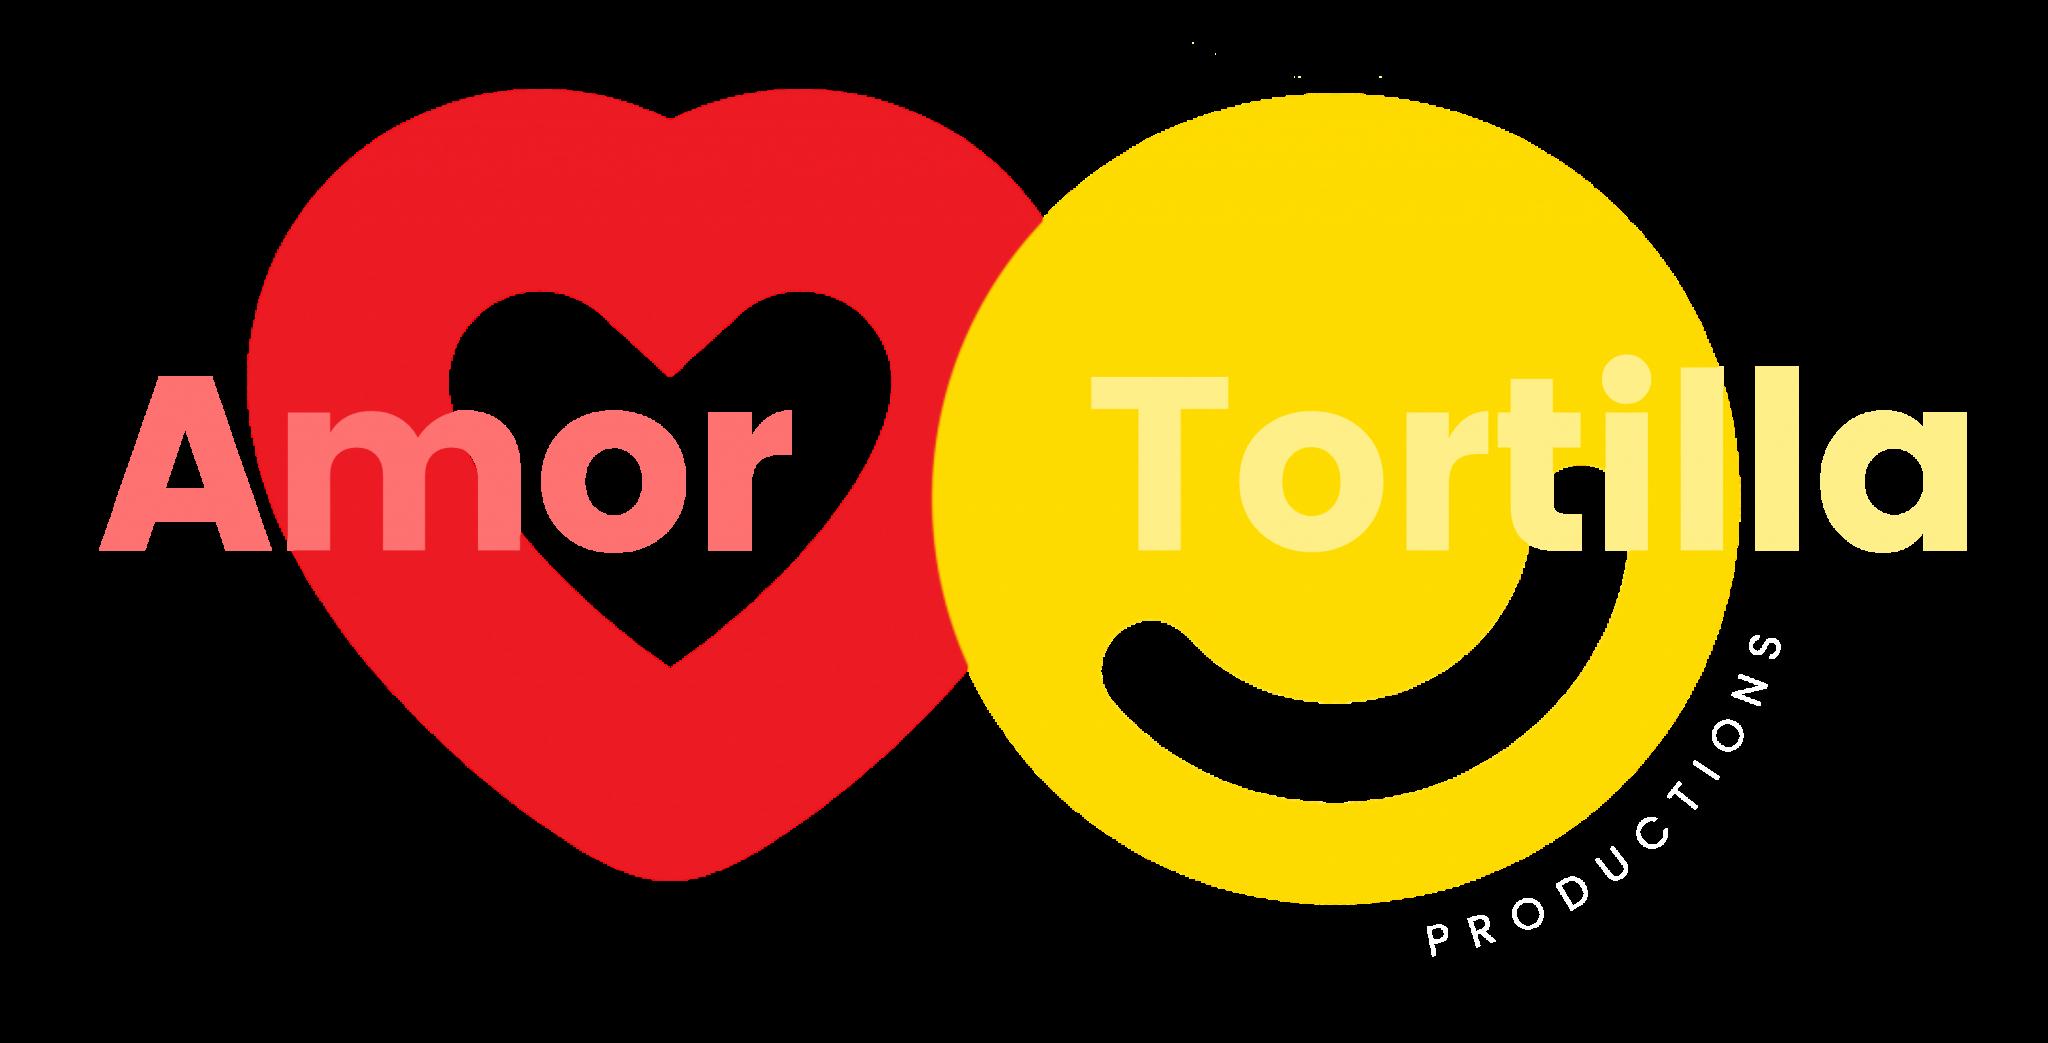 Amor-y-Tortilla-8-e1615988050953-2048x1043